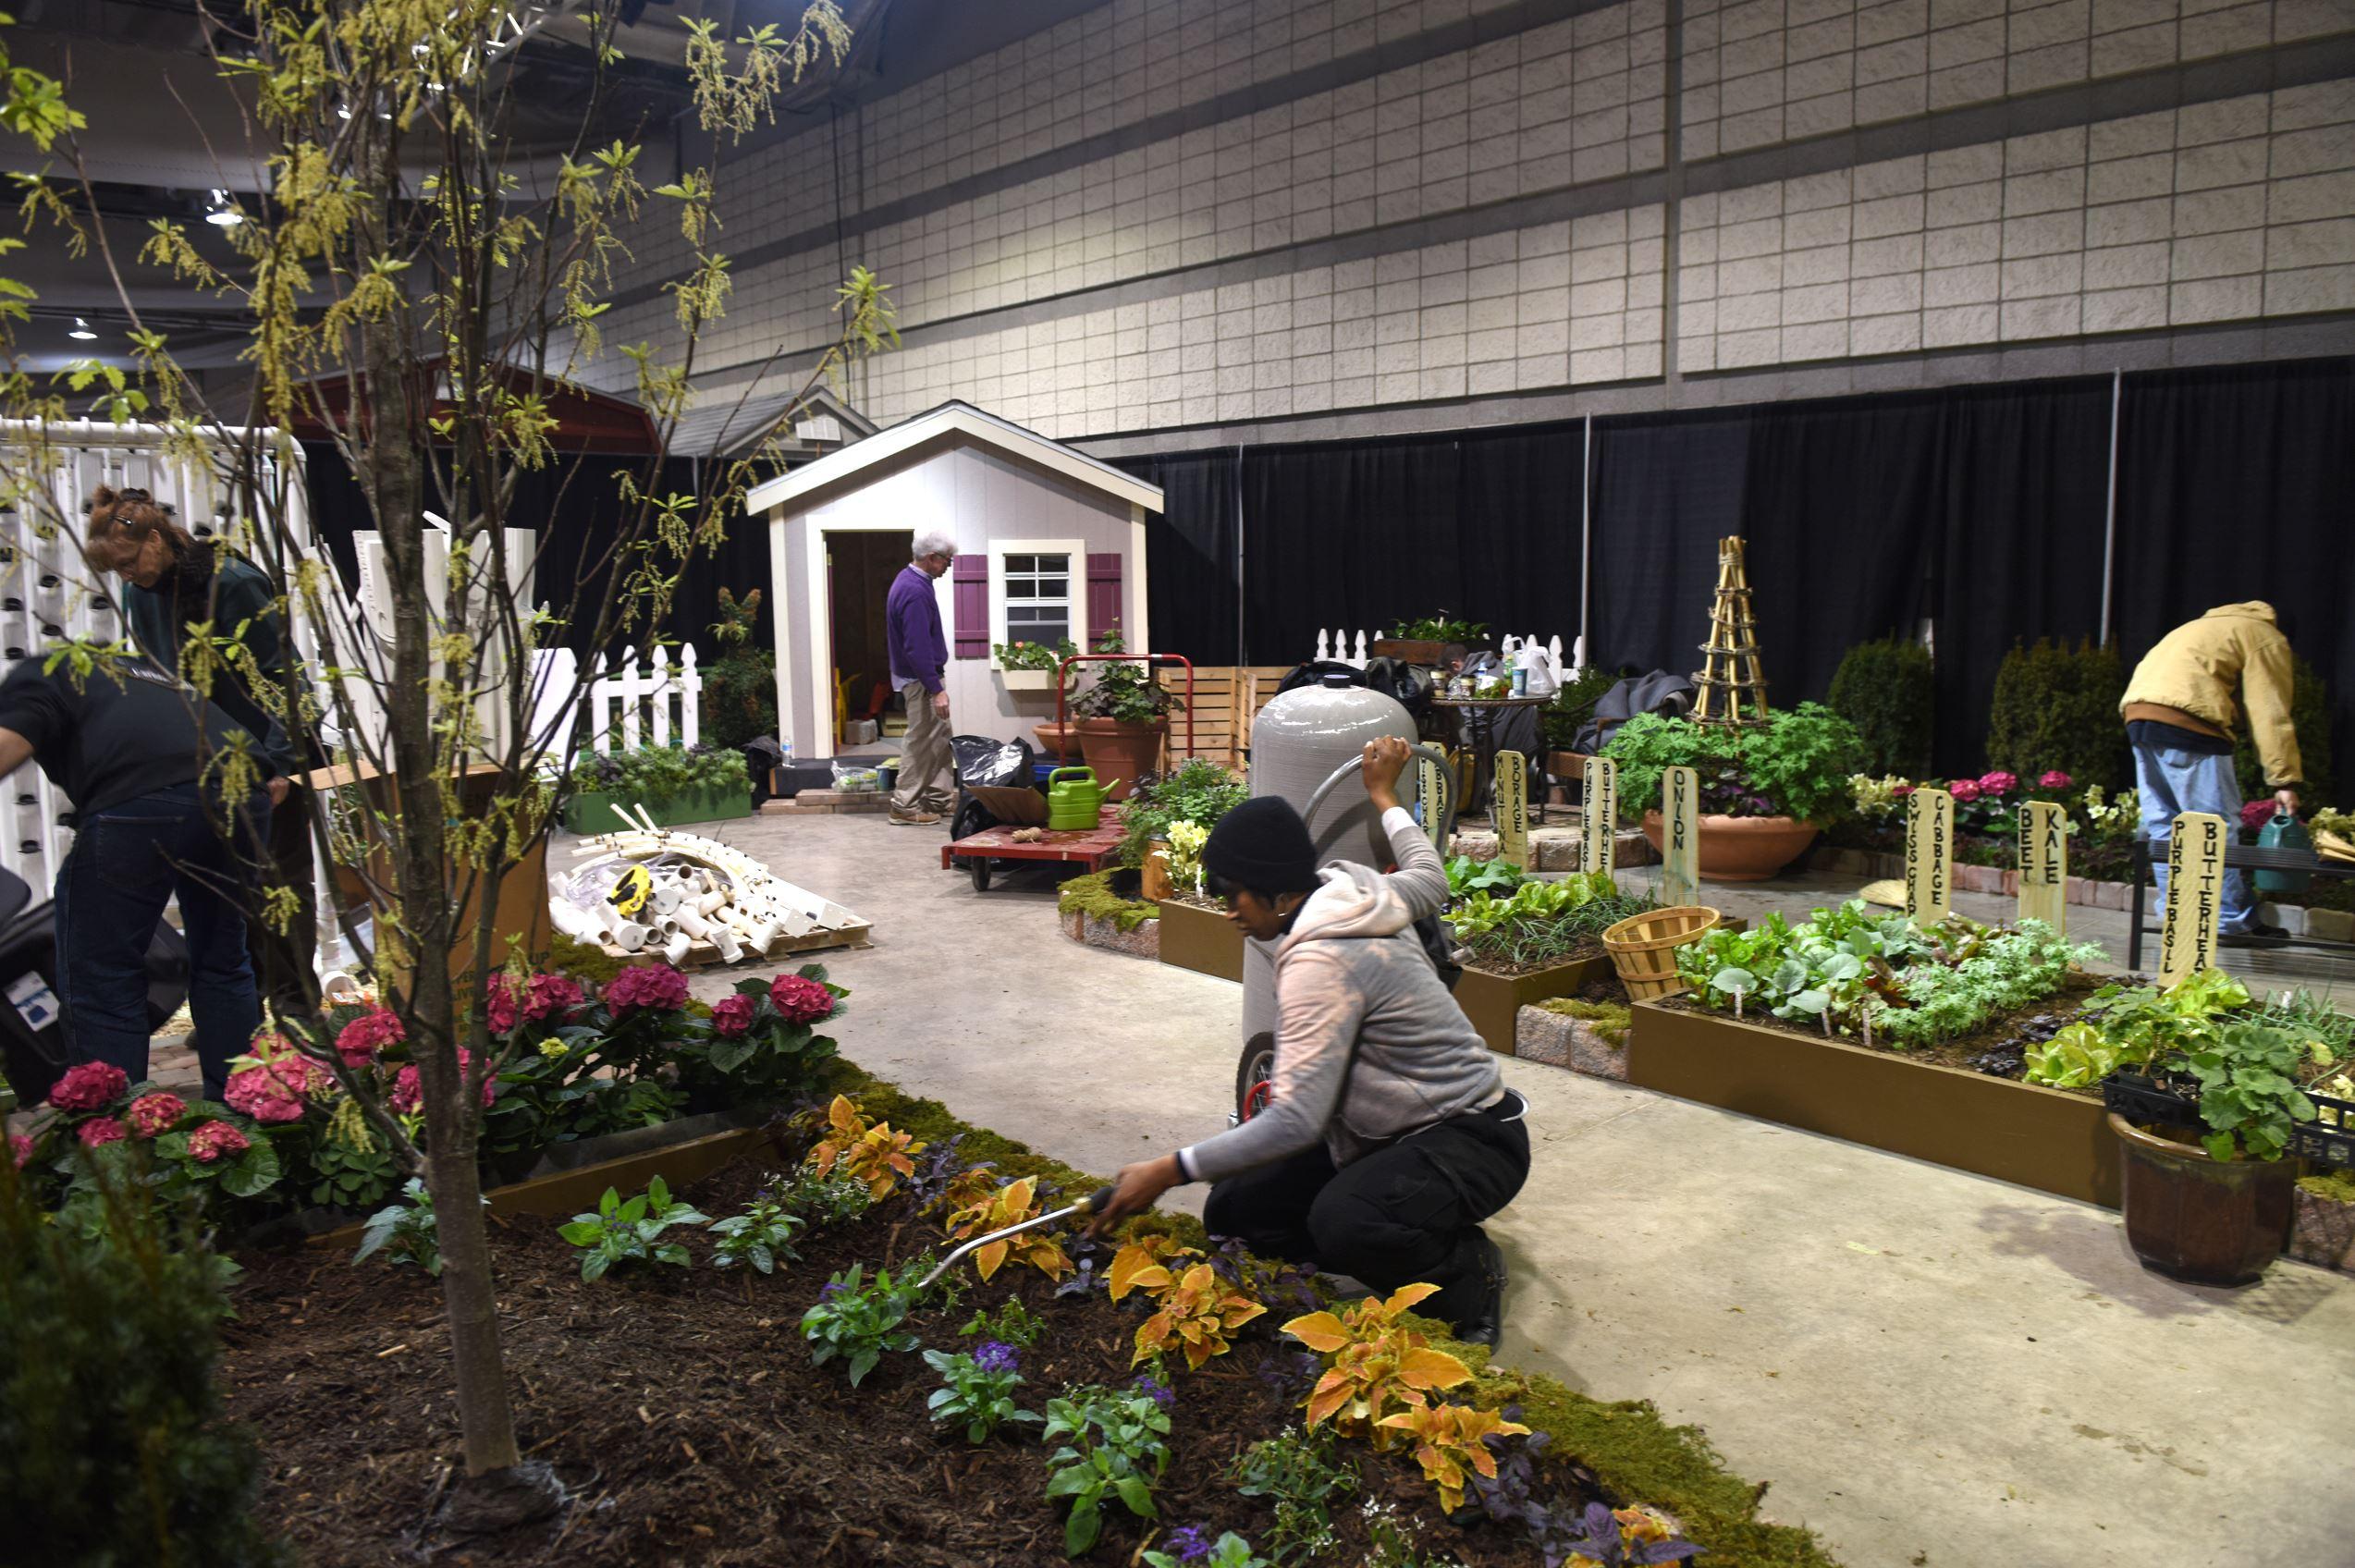 Garden And Home Show Best Idea Garden